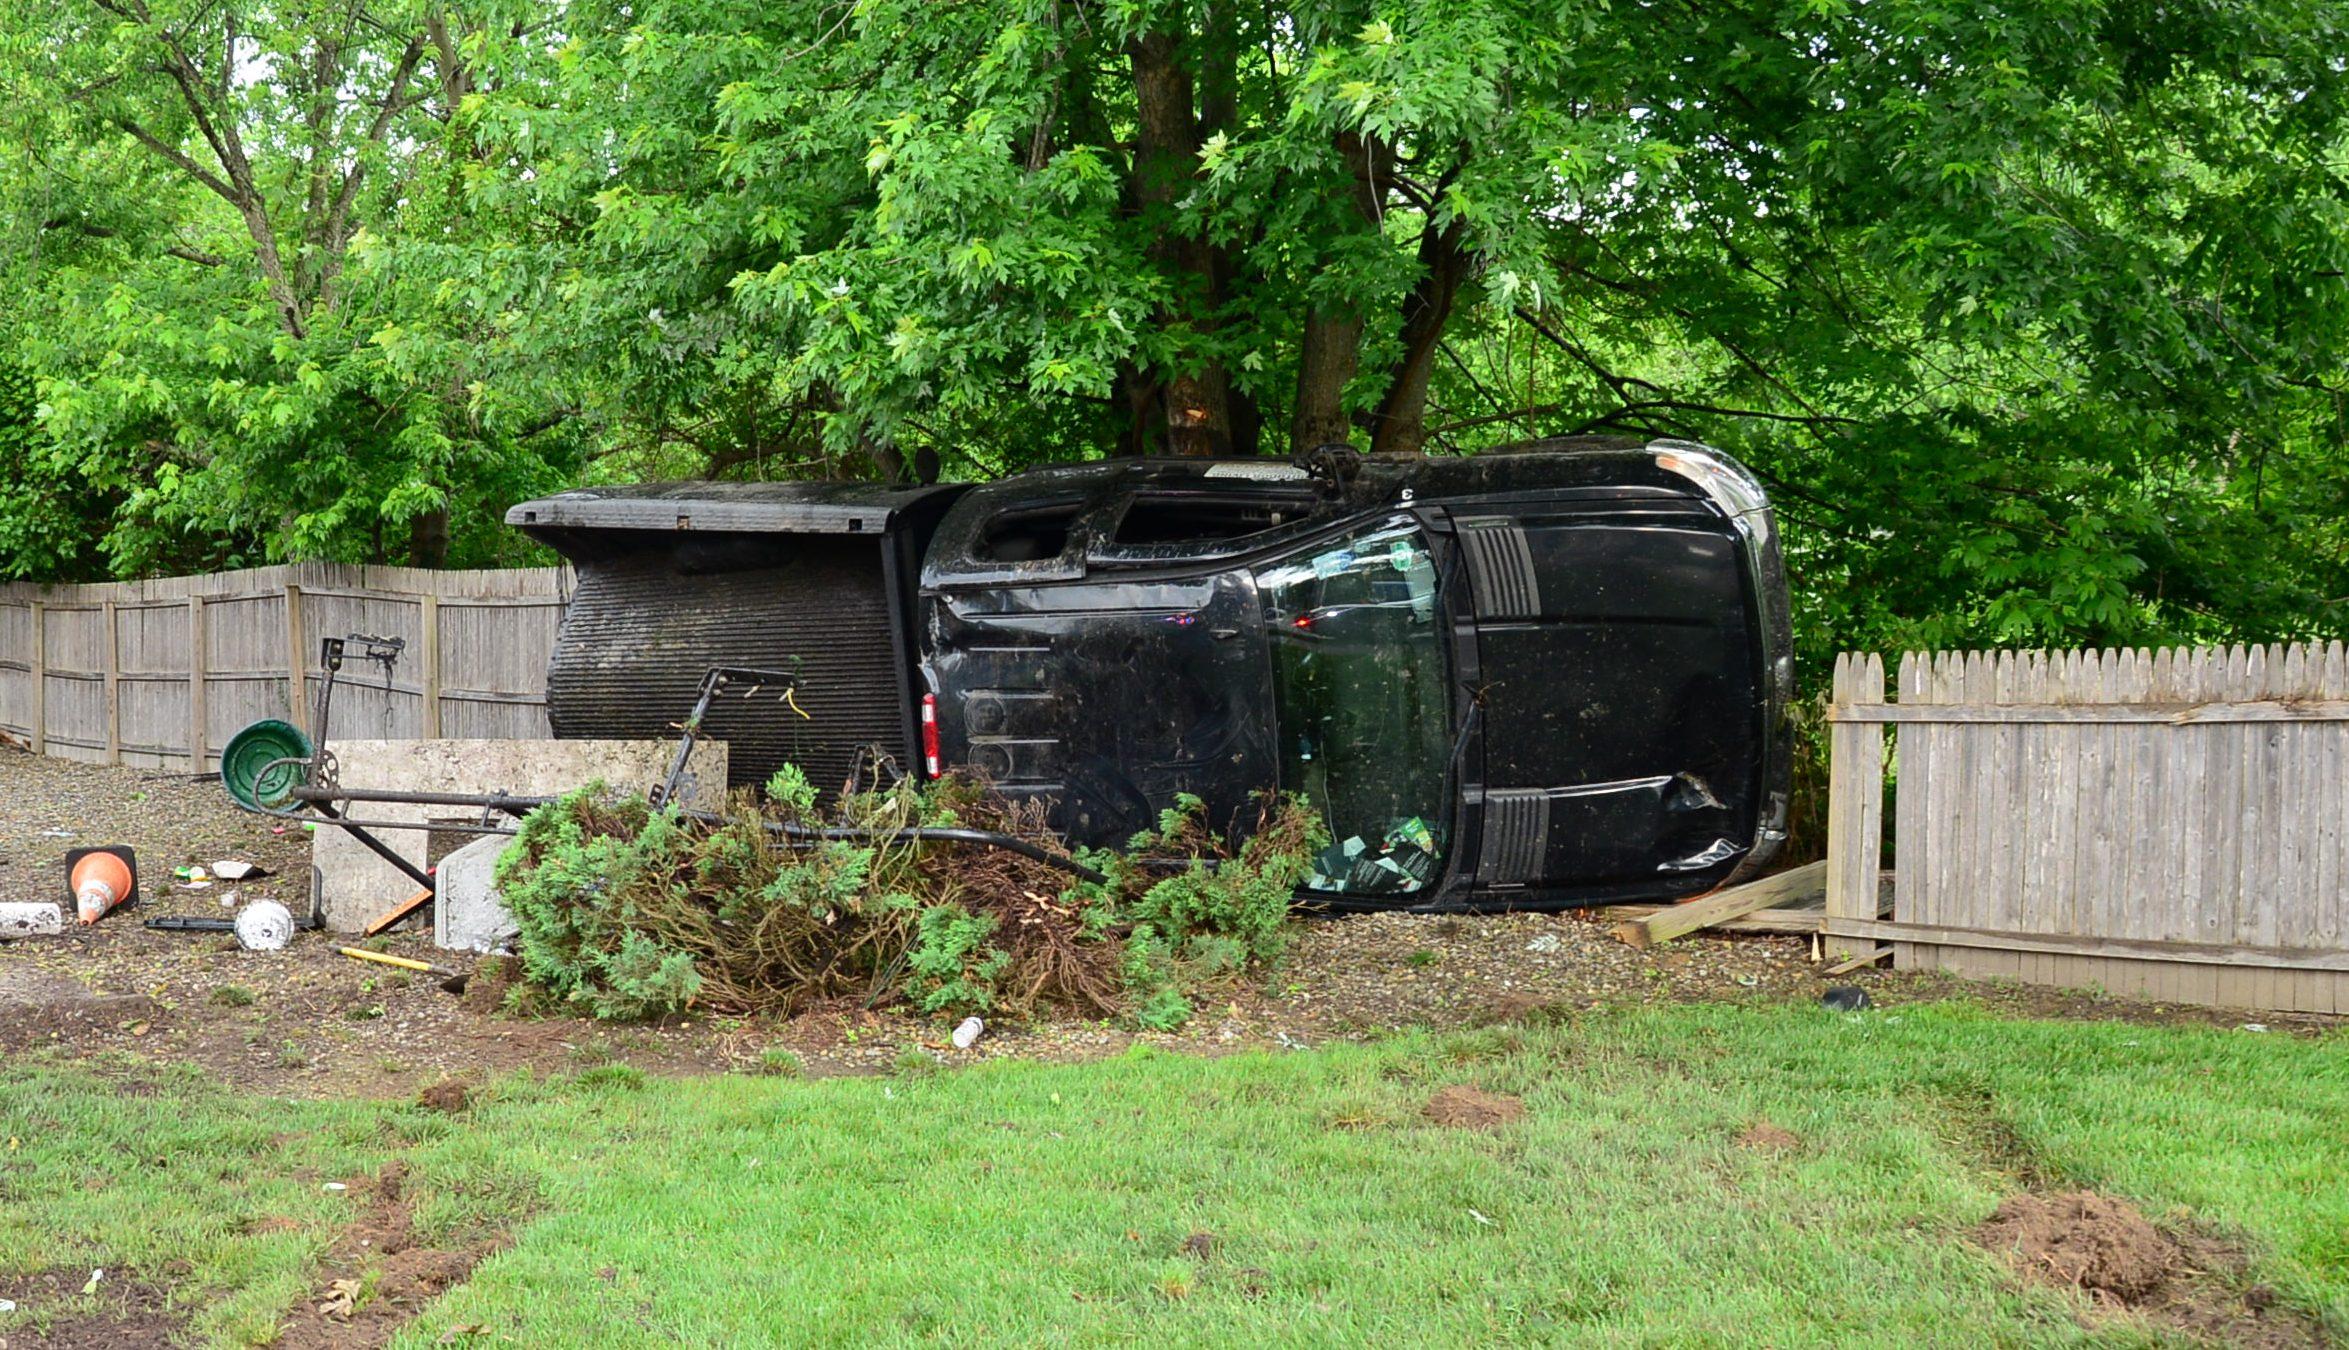 A crash in Brick Township, June 6, 2018. (Photo: Daniel Nee)